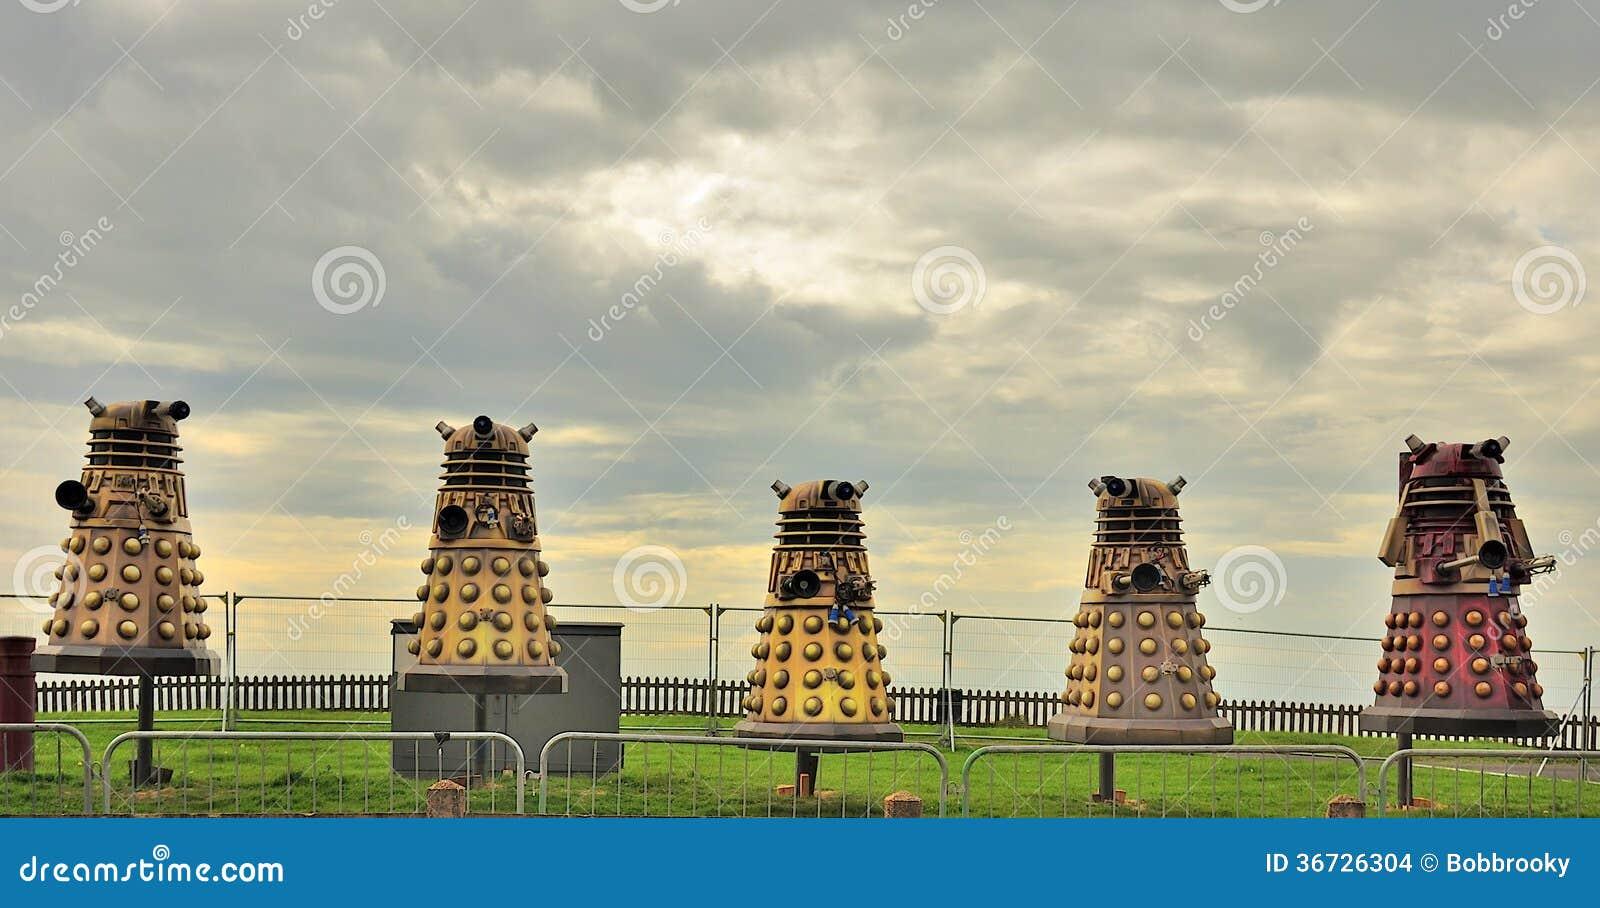 Blackpool Illuminations Daleks Editorial Stock Image ...